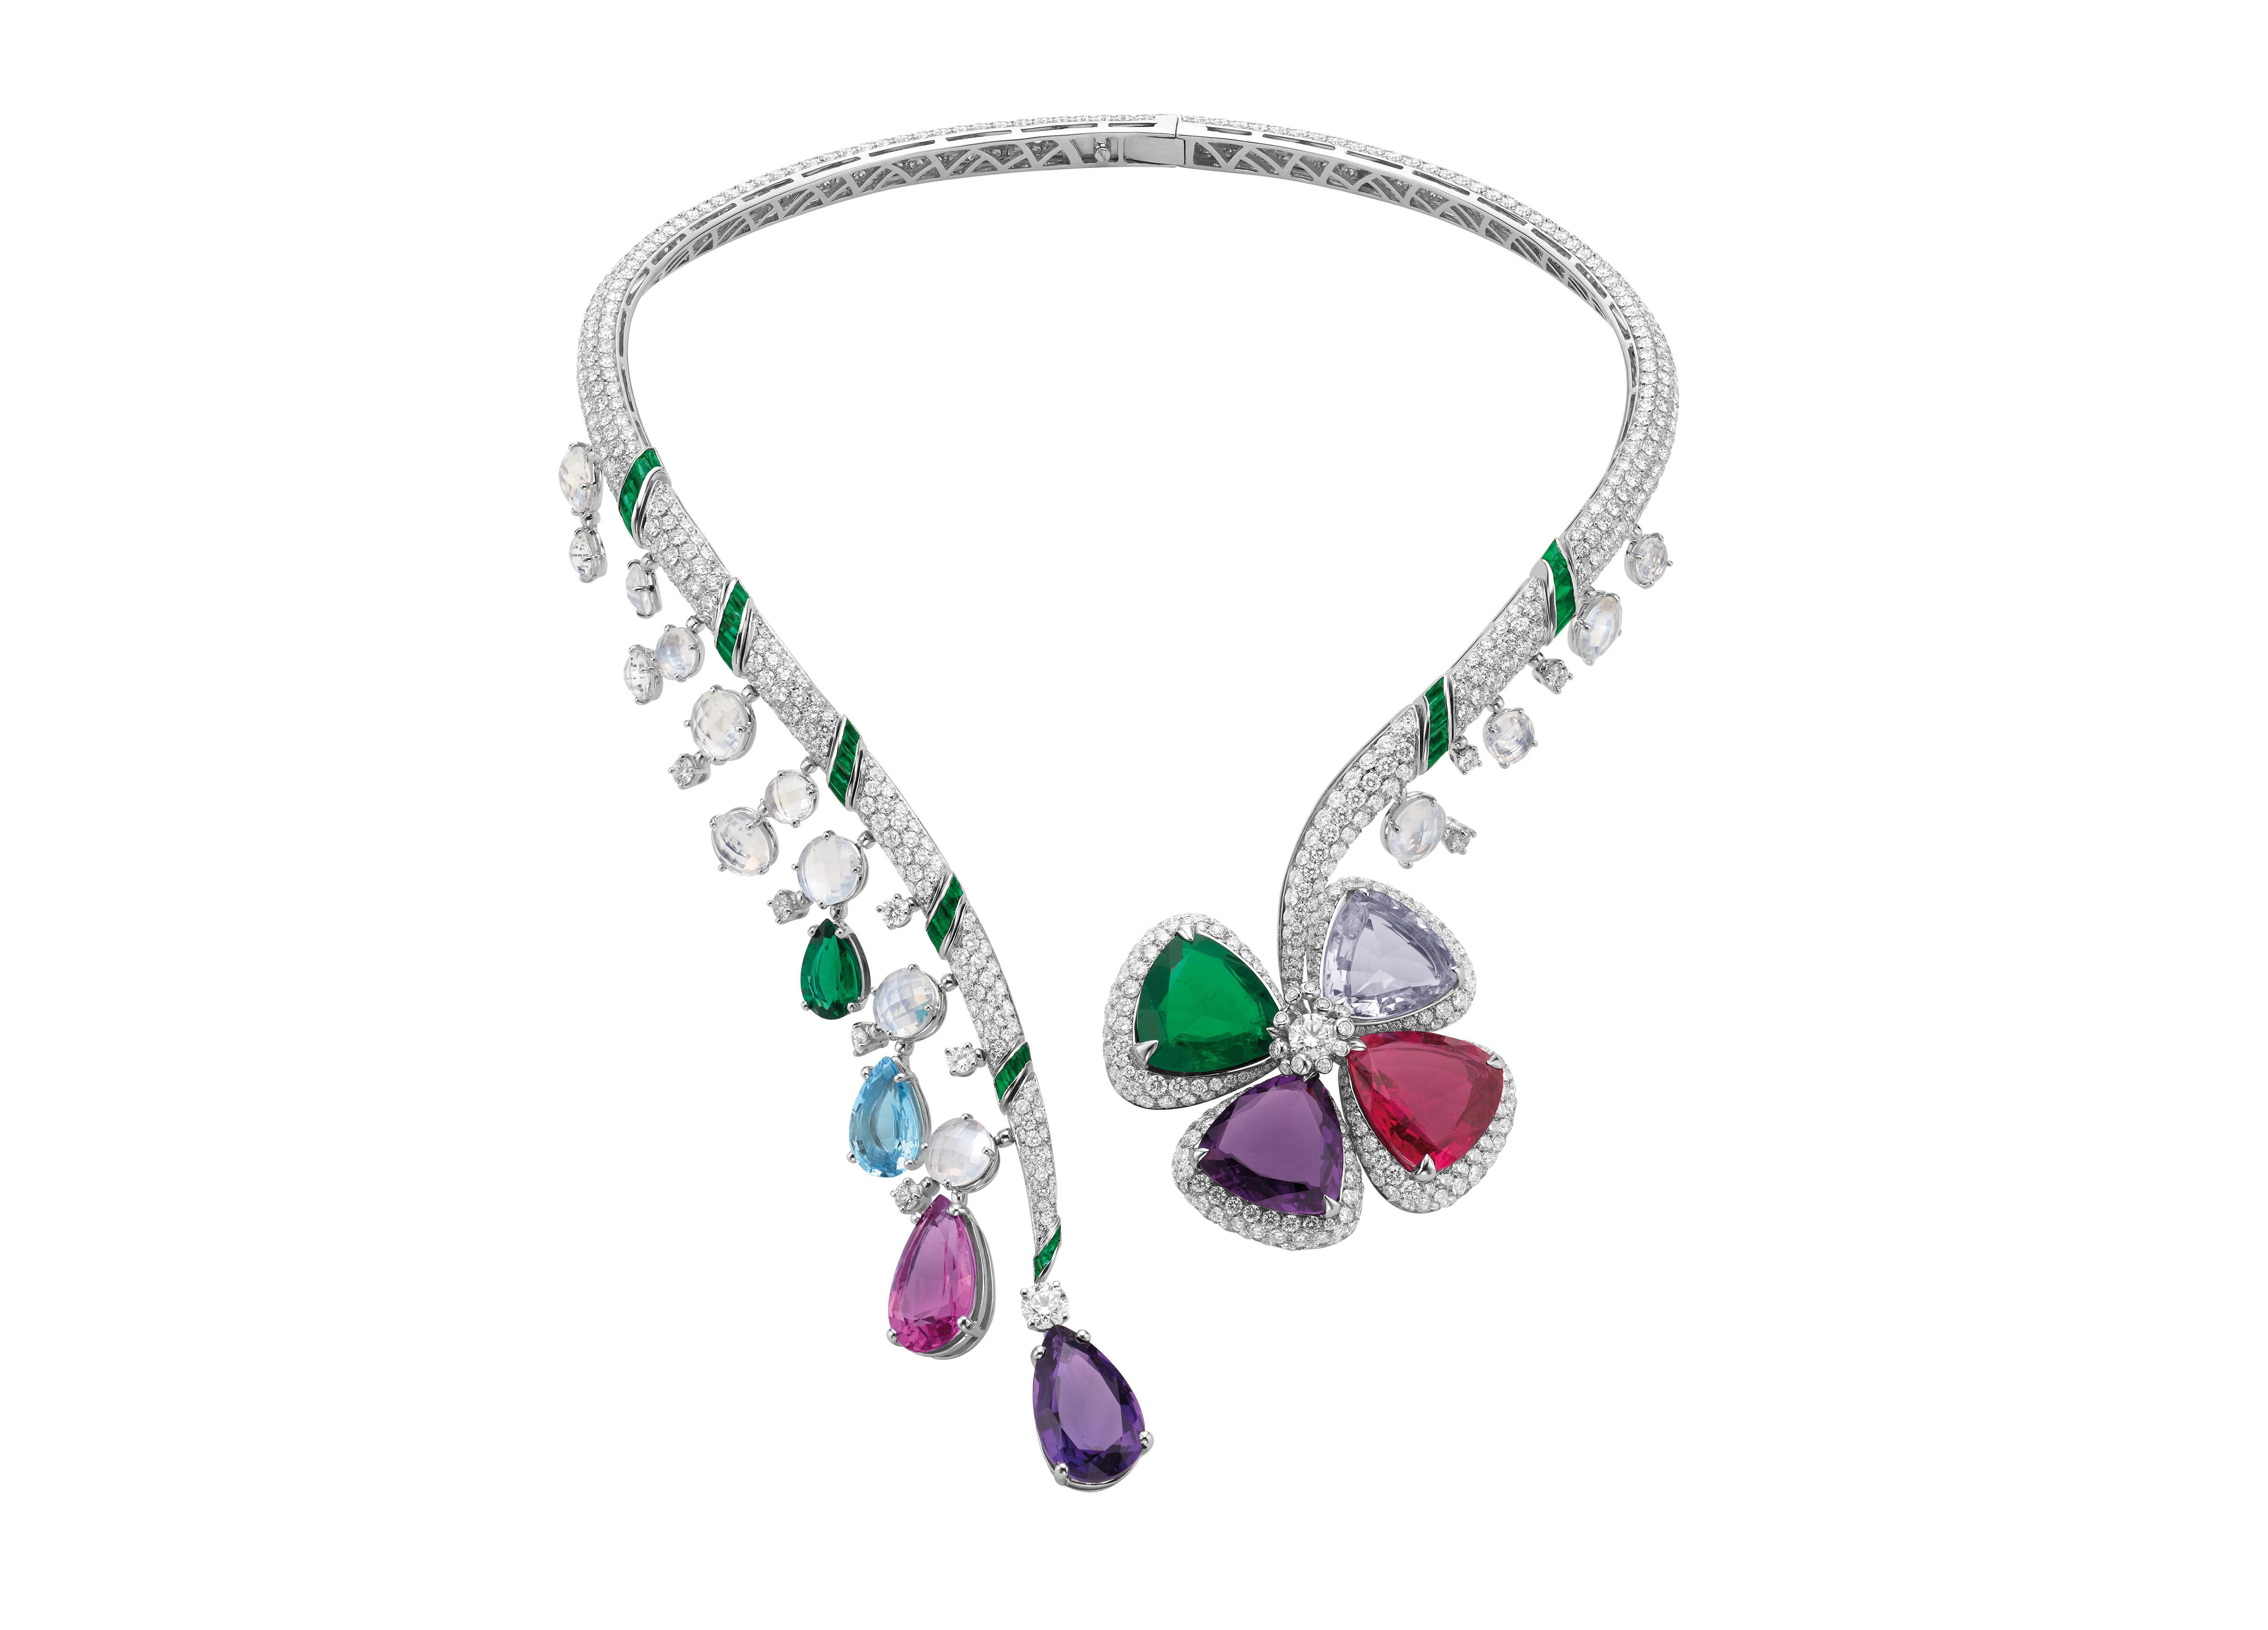 fiore ingenuo high jewellery necklace